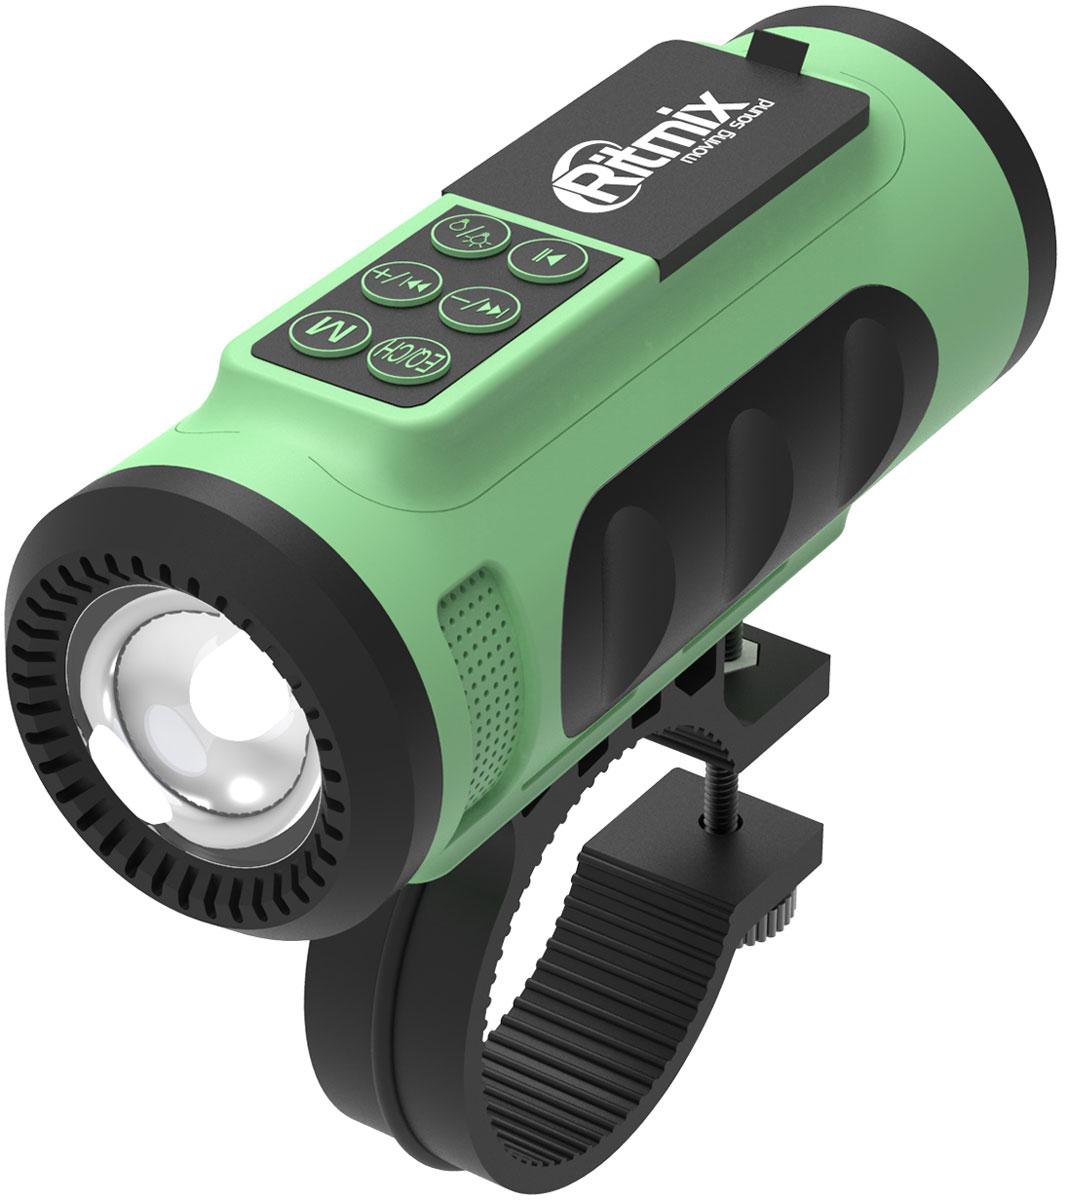 Ritmix SP-520BC, Green Black портативная акустическая система